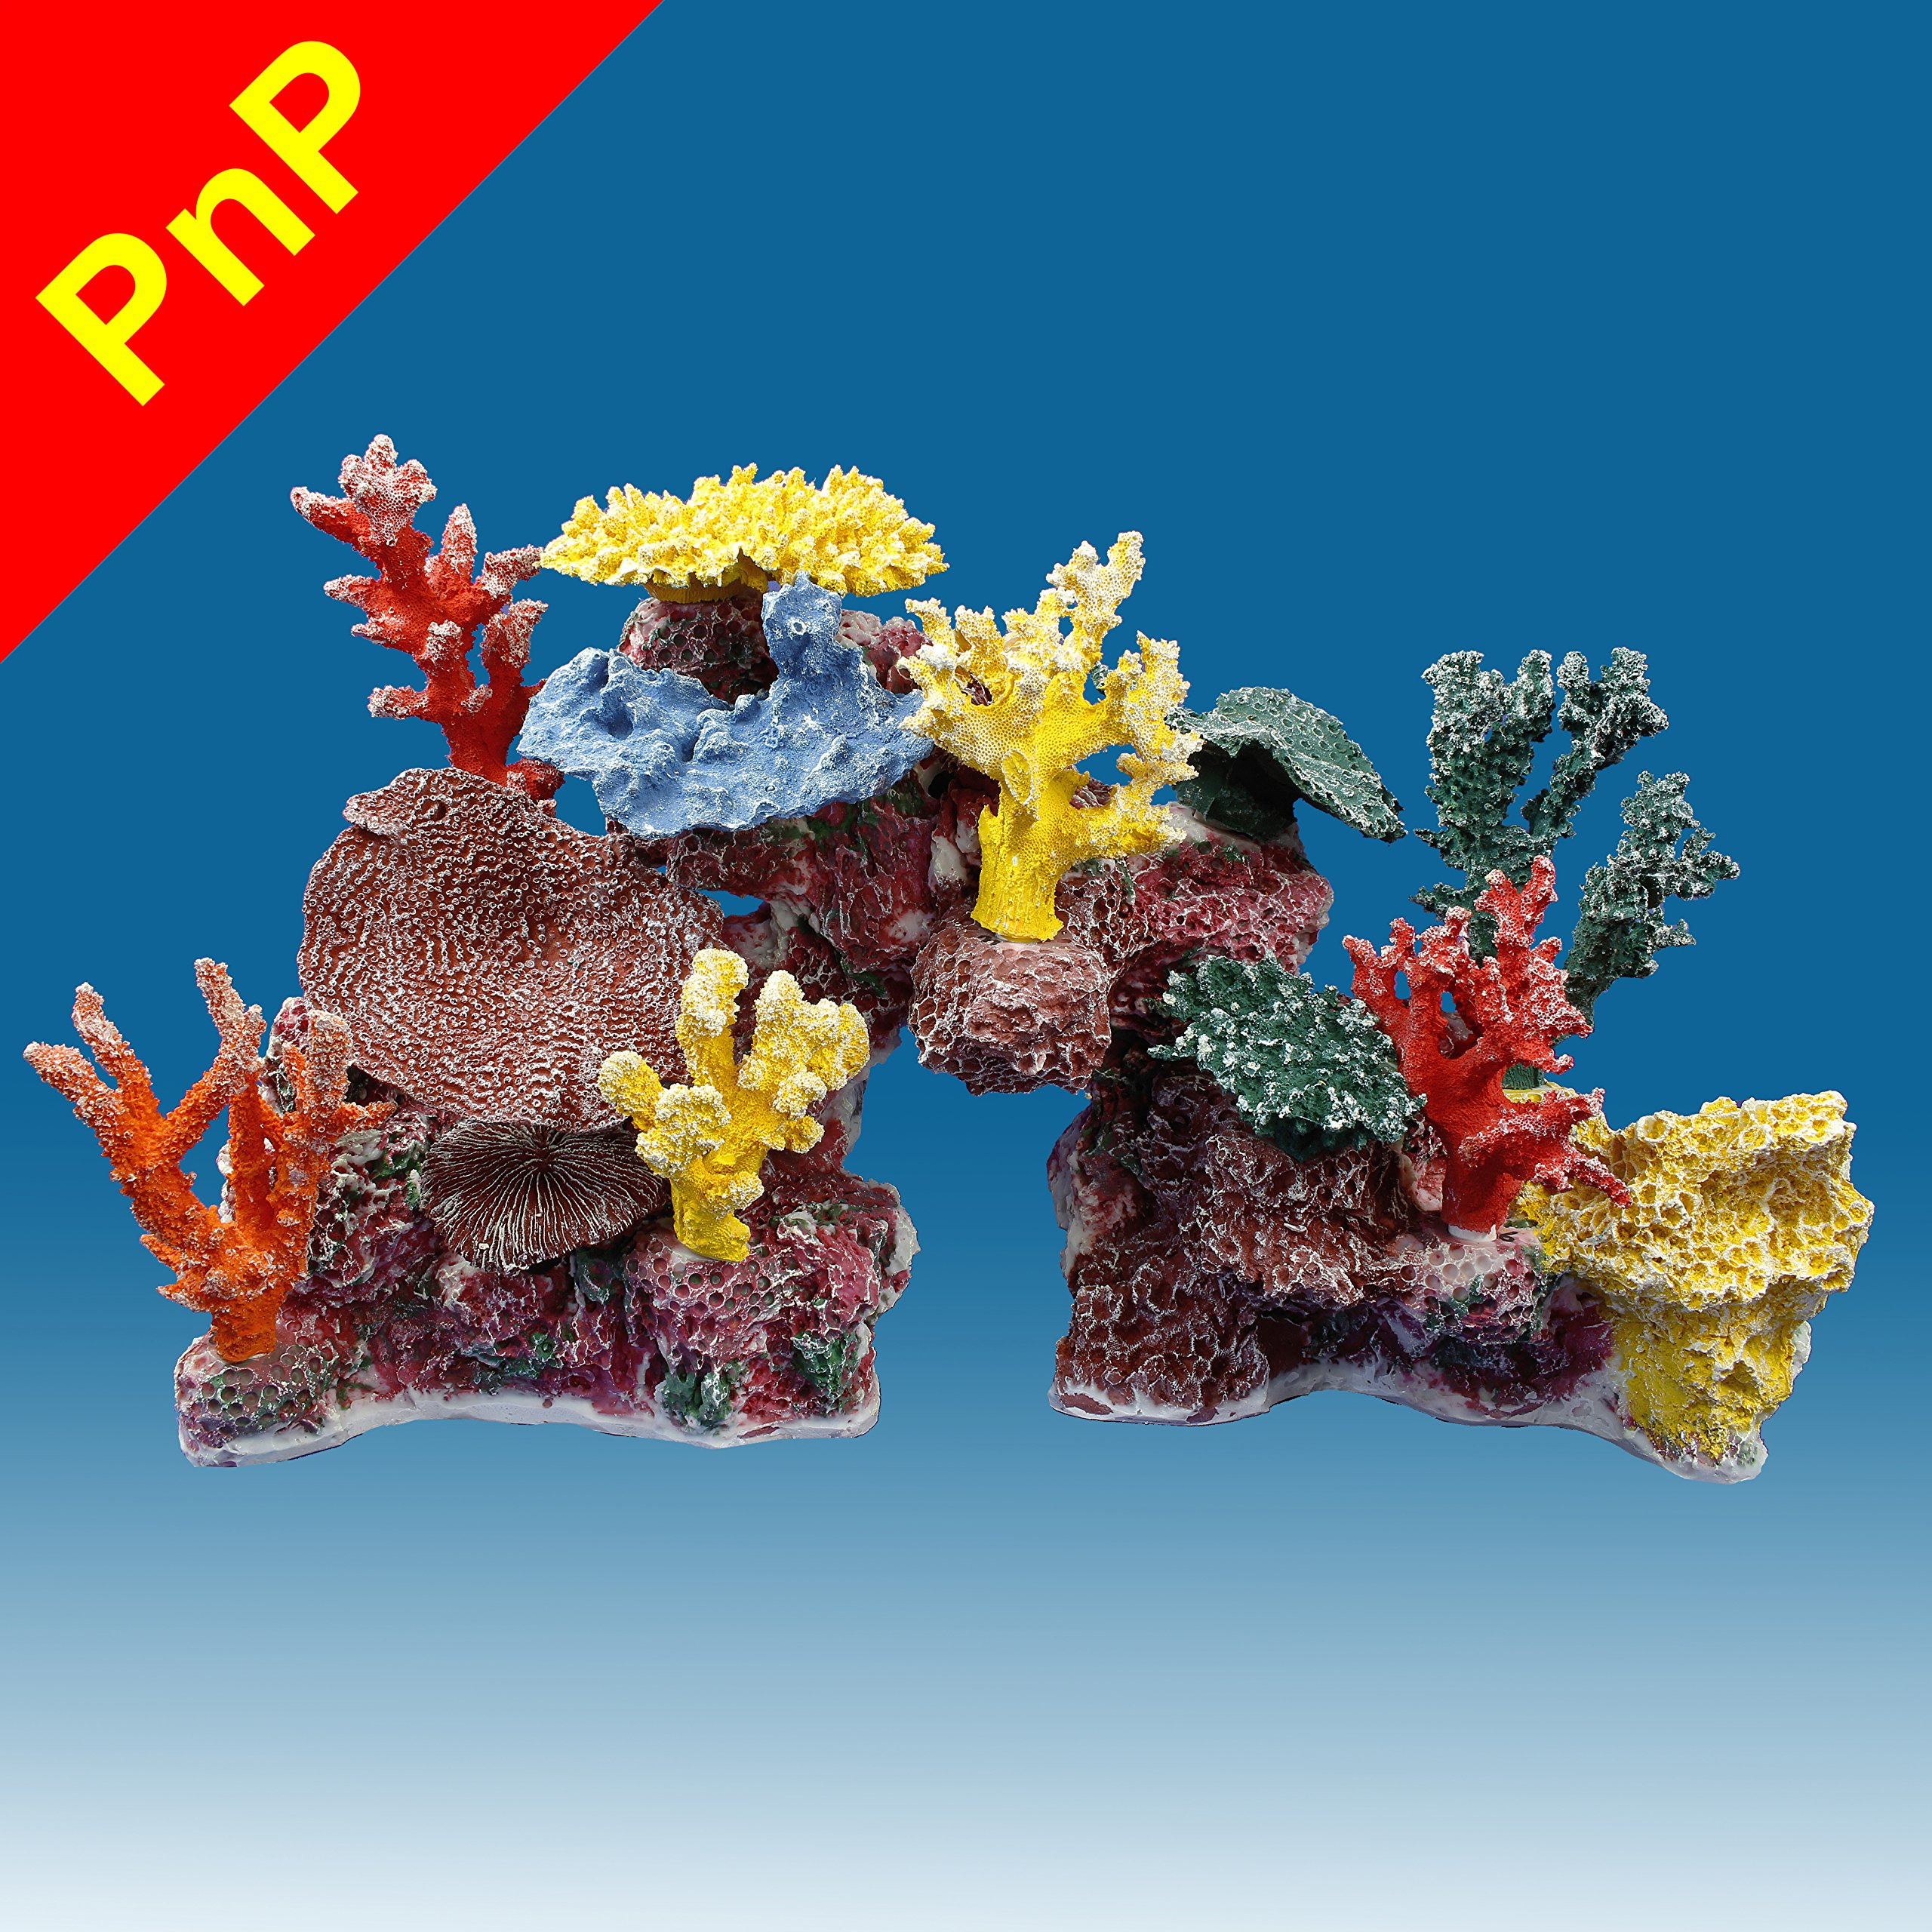 Instant Reef DM045PNP Artificial Coral Reef Aquarium Decor for Saltwater Fish, Marine Fish Tanks and Freshwater Fish Aquariums